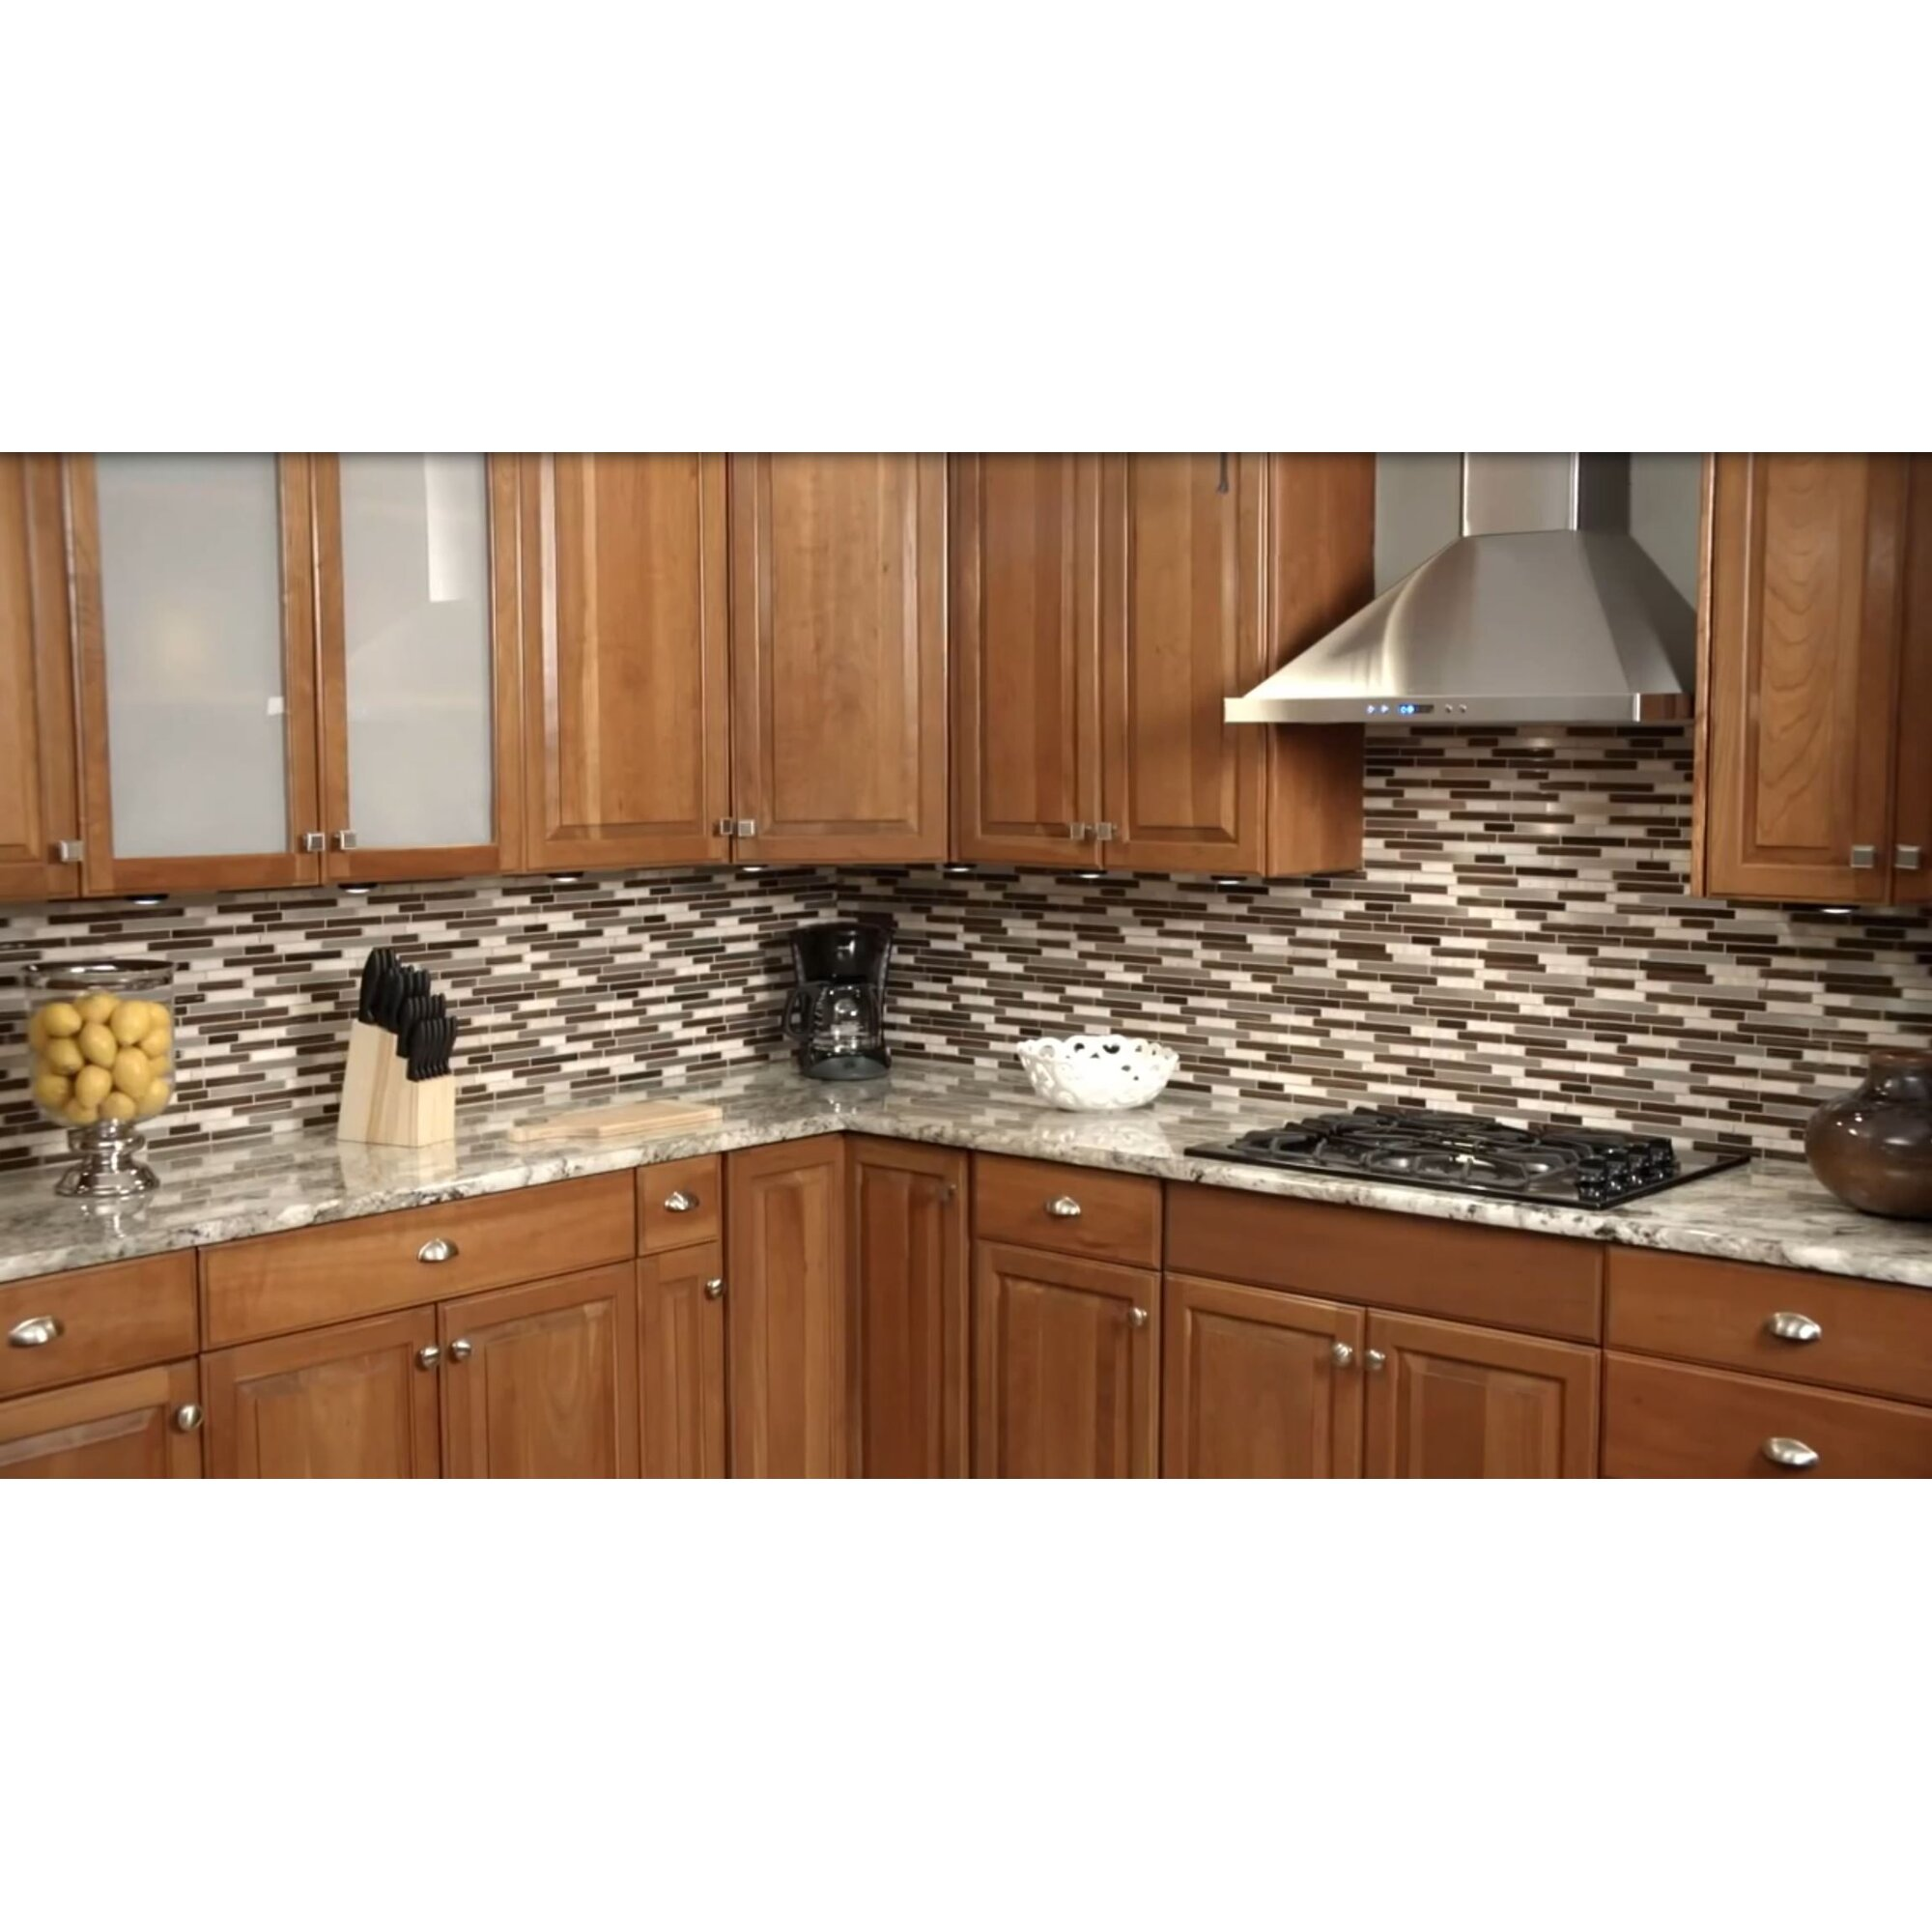 Stick on tiles for kitchen - 12 X 12 Glass Natural Stone Metal Peel Stick